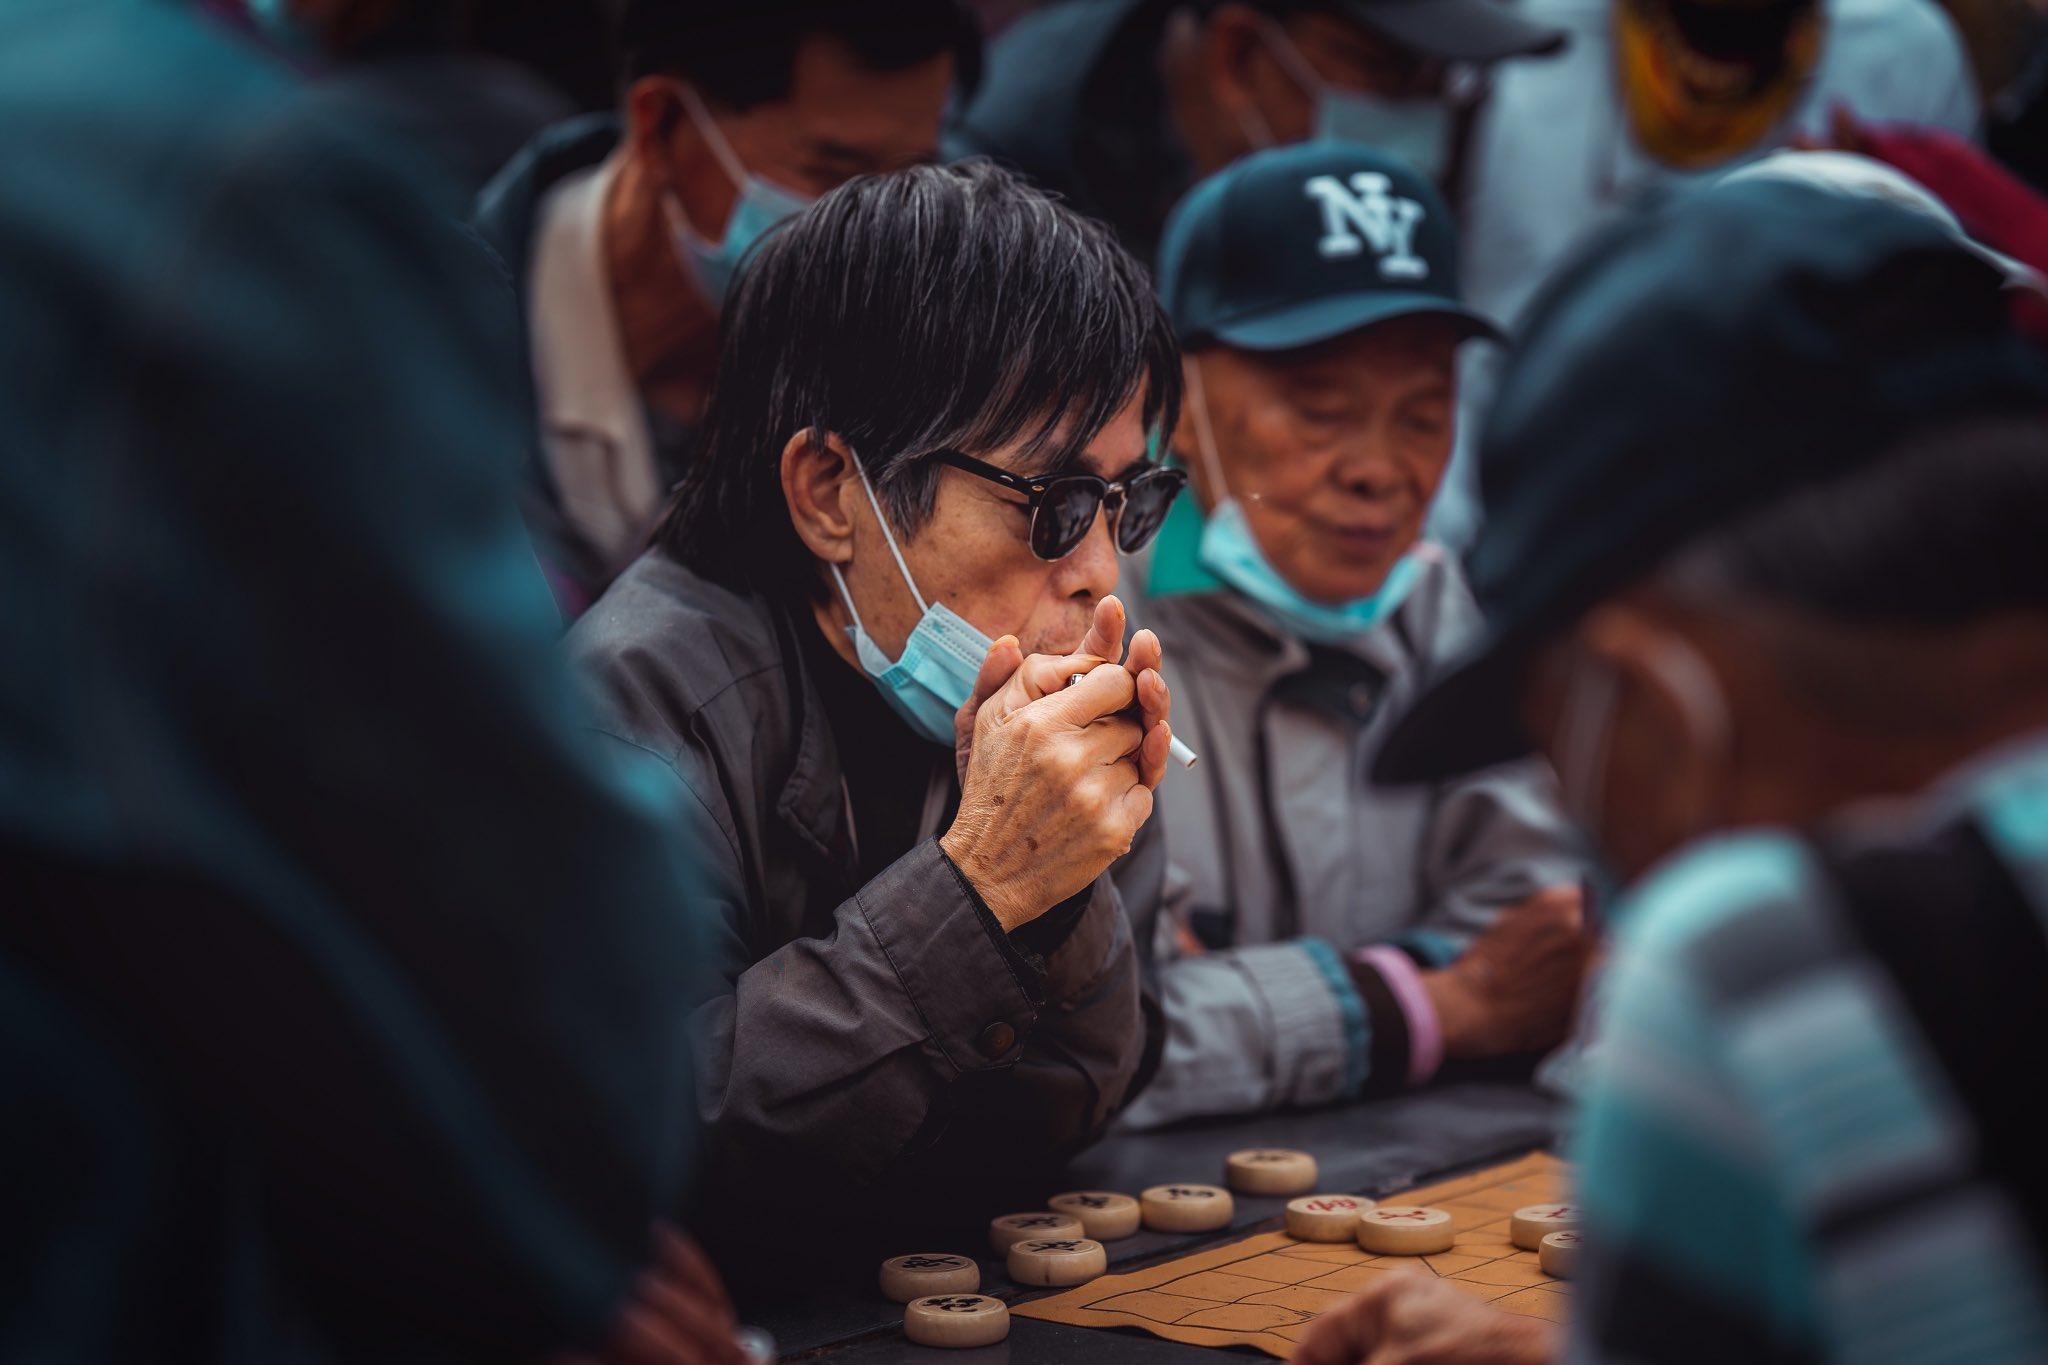 Eyes on the prize  #chinatown #newyorkcity #streetphotography https://t.co/tRLJpLzCxo